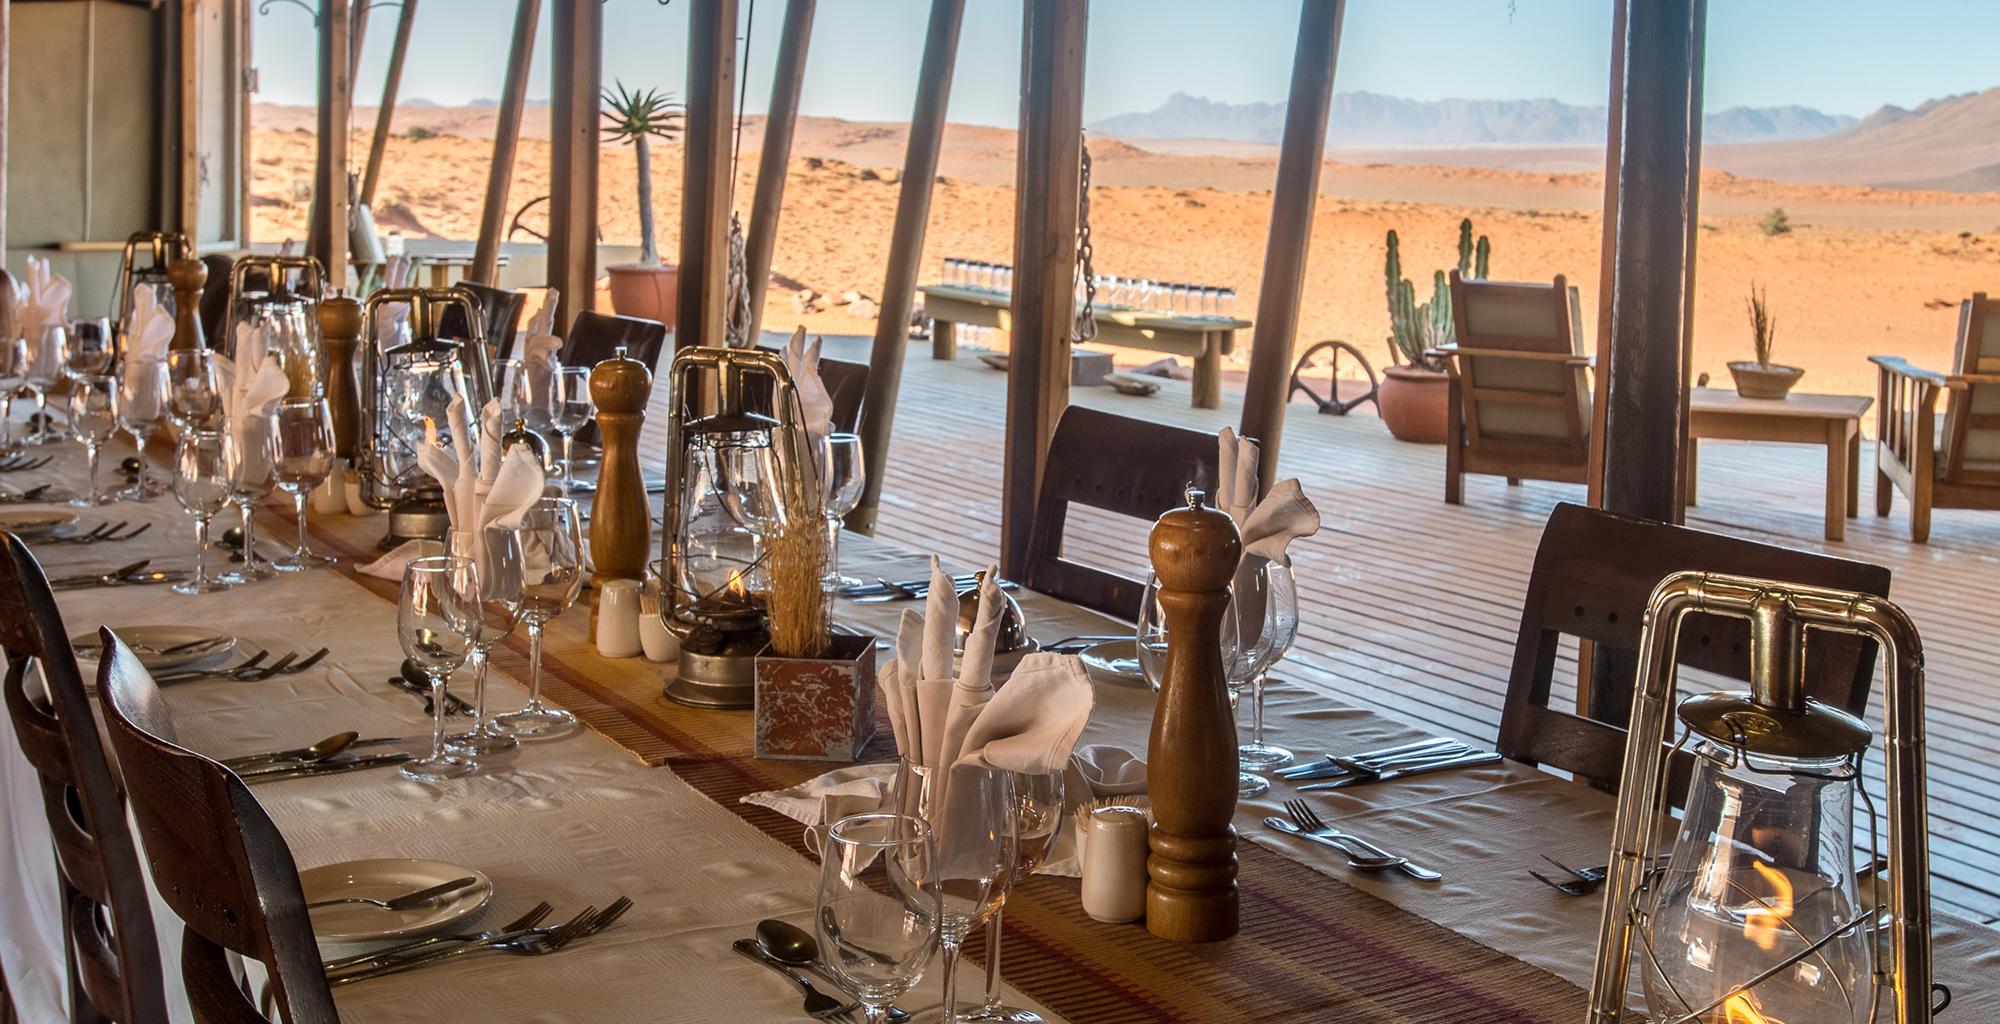 Namibia-Wolwedans-Dune-Camp-Dining